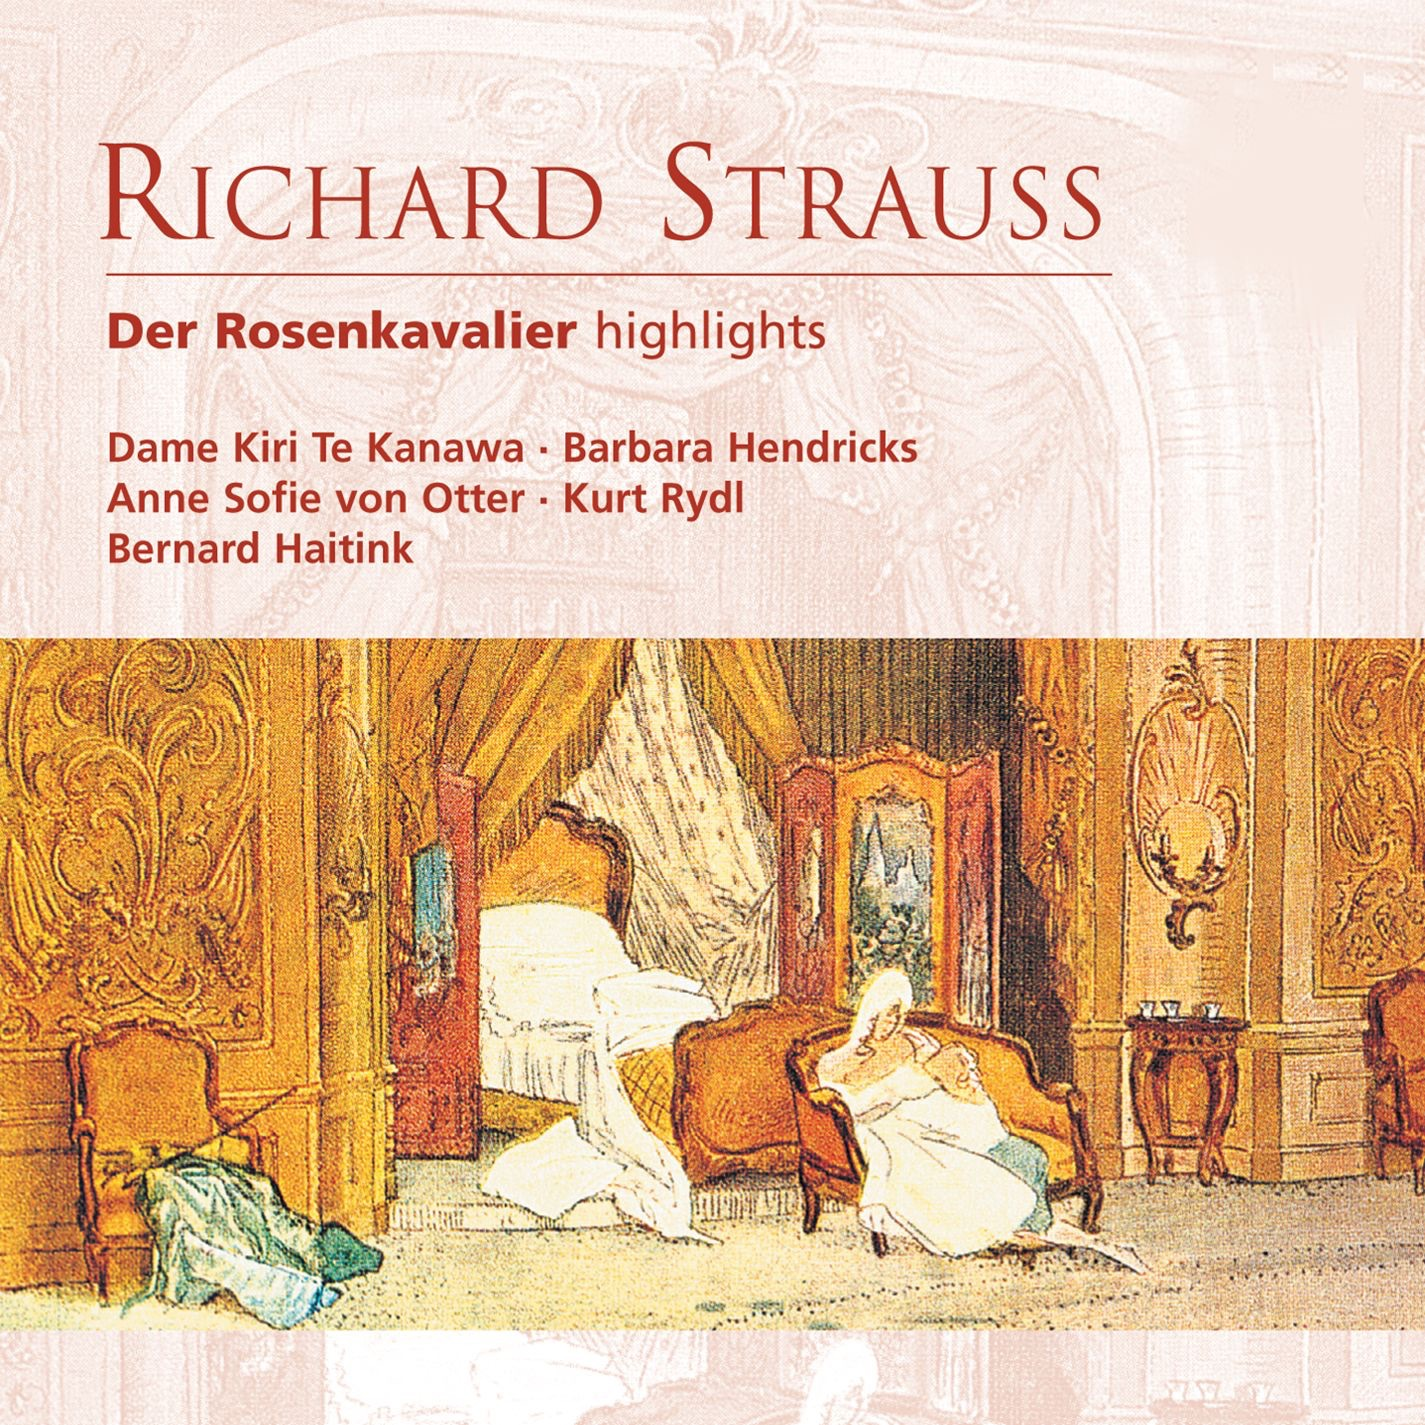 Der Rosenkavalier (highlights), Act III: Ach, lass' Sie schon einmal das fade Wort! (Baron Ochs, Octavian)...